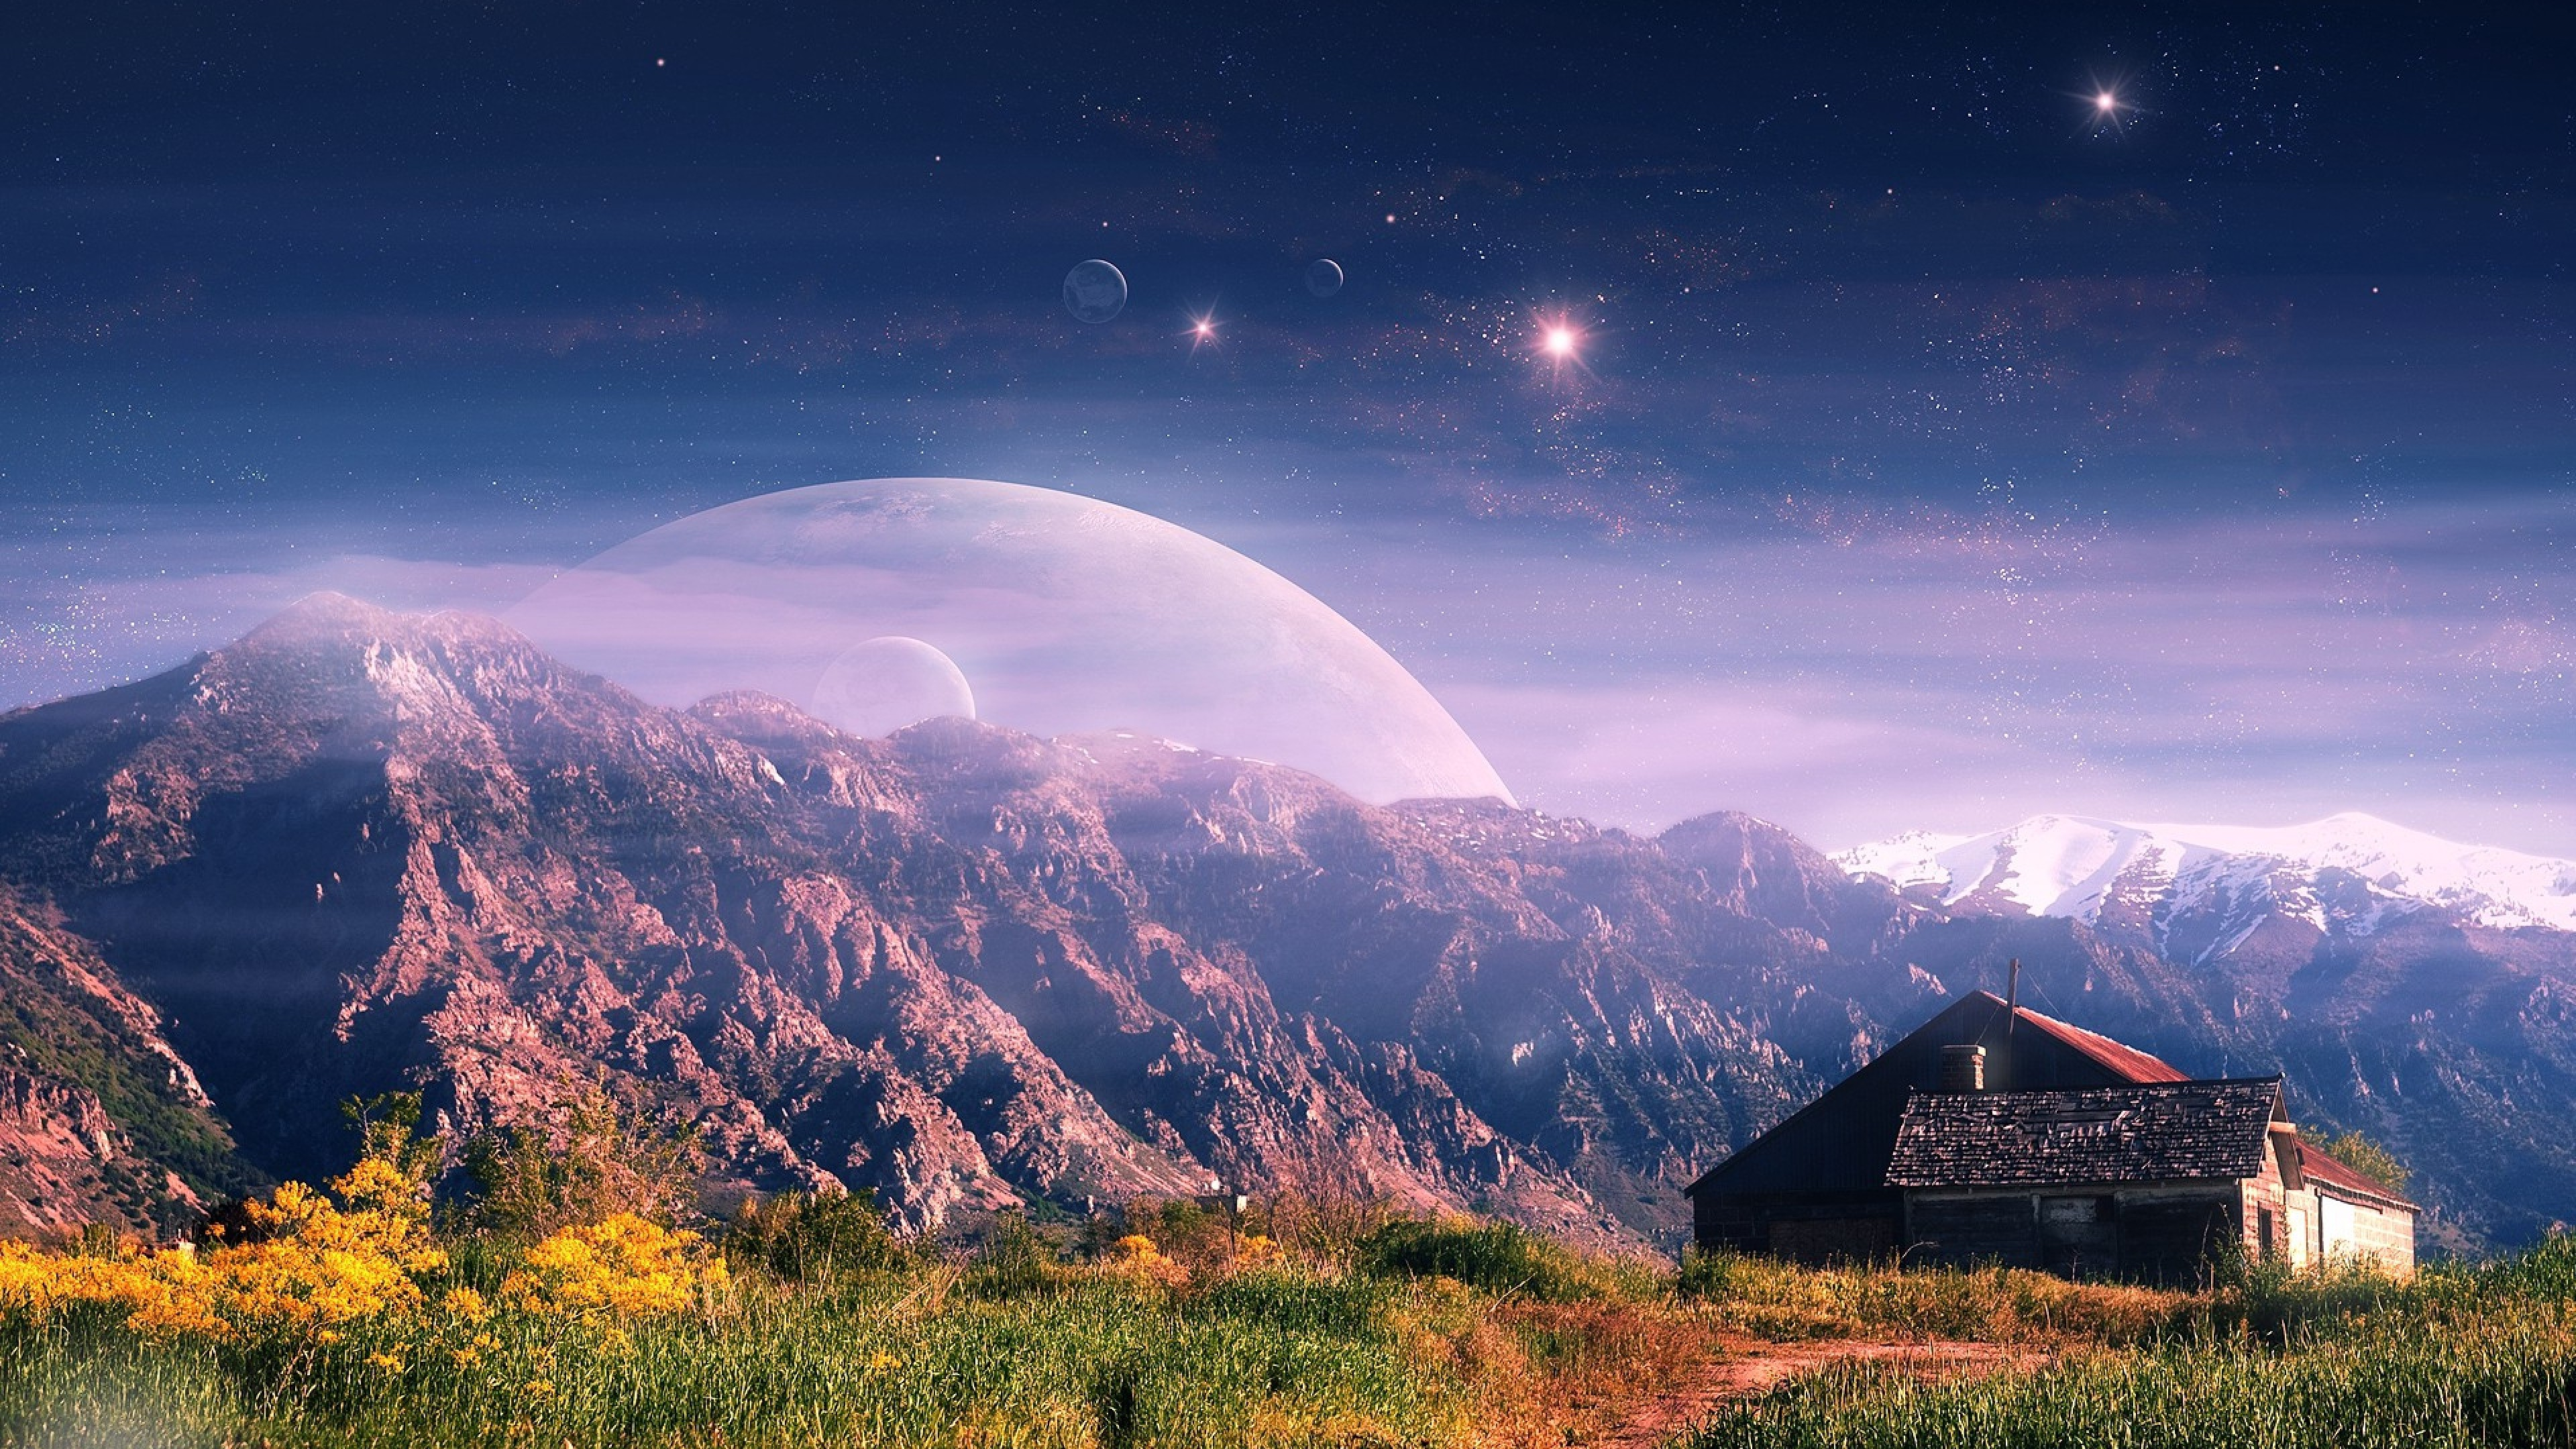 Cool Wallpaper Mountain Fantasy - mountain-house-fantasy  2018_918485.jpg